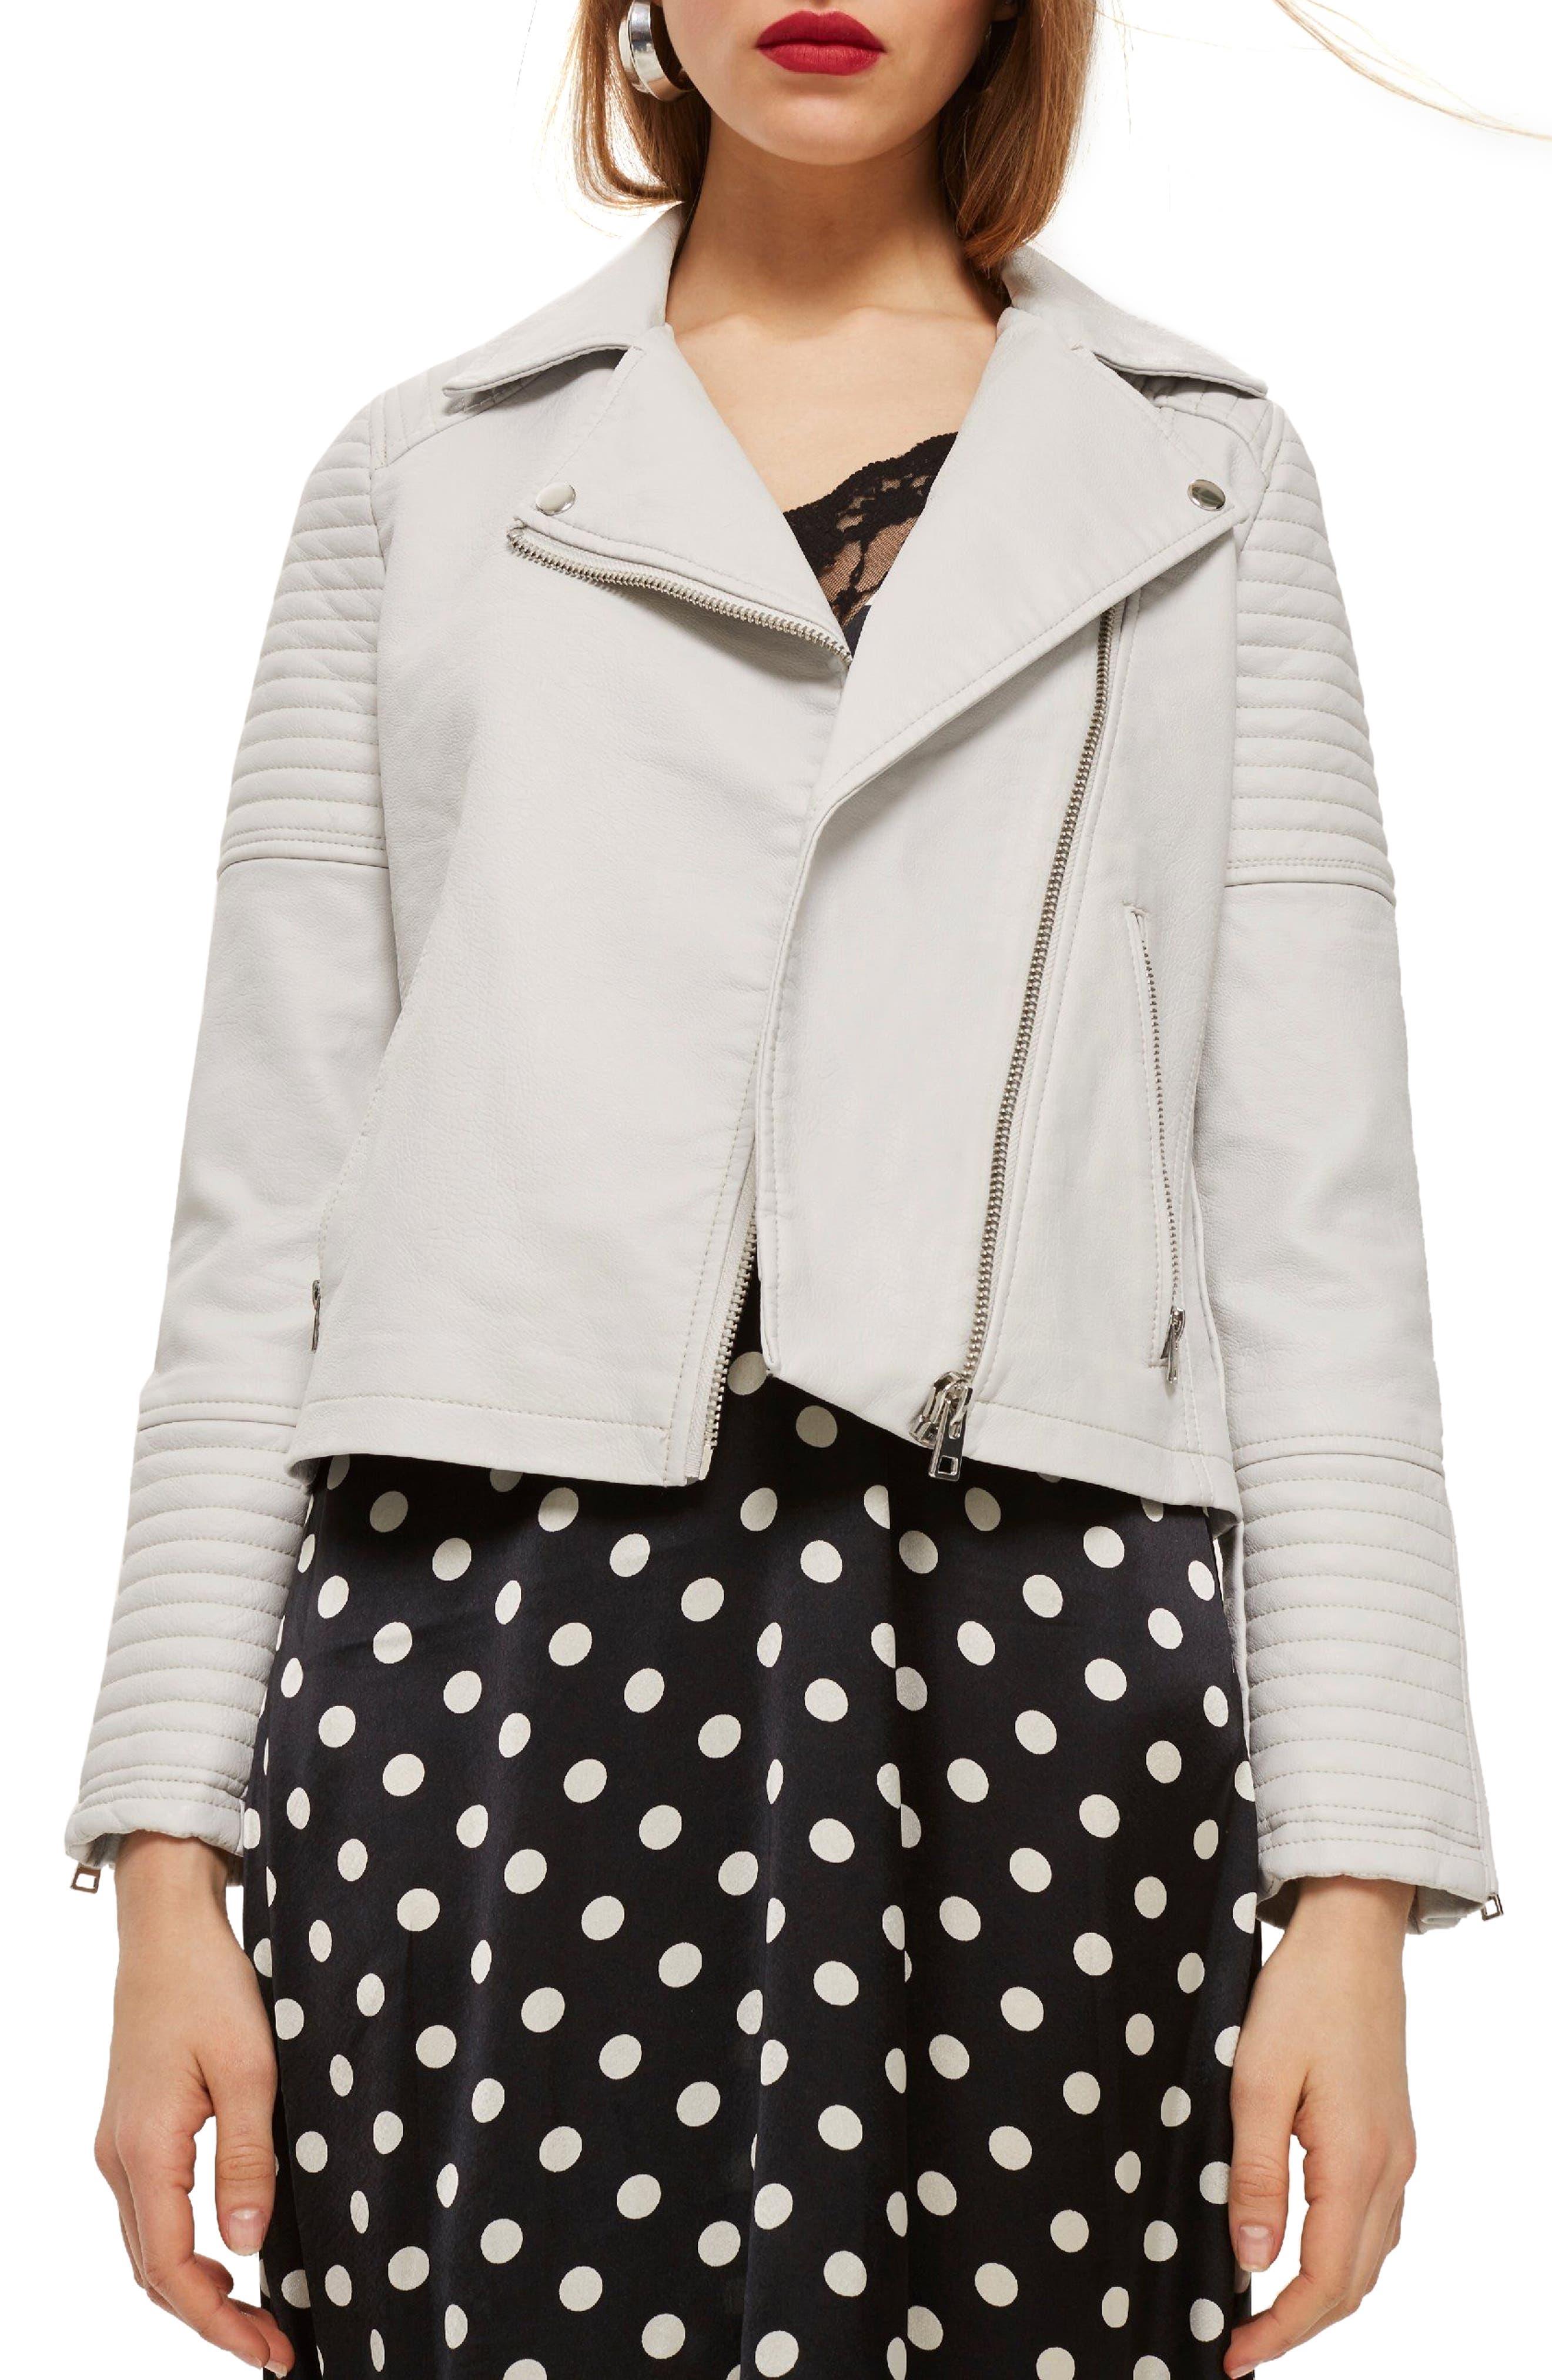 Rosa Biker Jacket,                             Main thumbnail 1, color,                             White